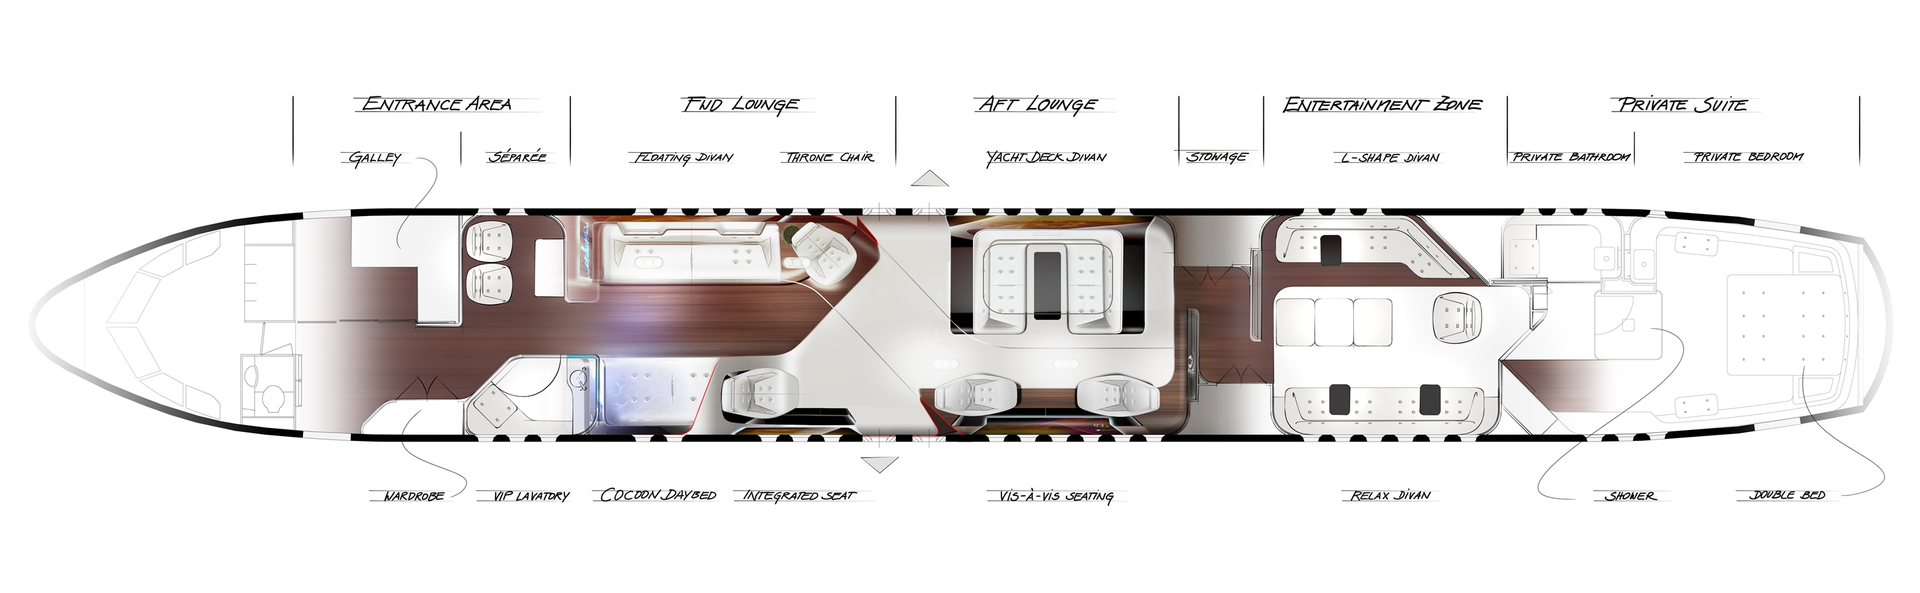 Mercedes Benz Style Vip Cabin Floorplan Revealed At Dubai Air Show Aviation Pros